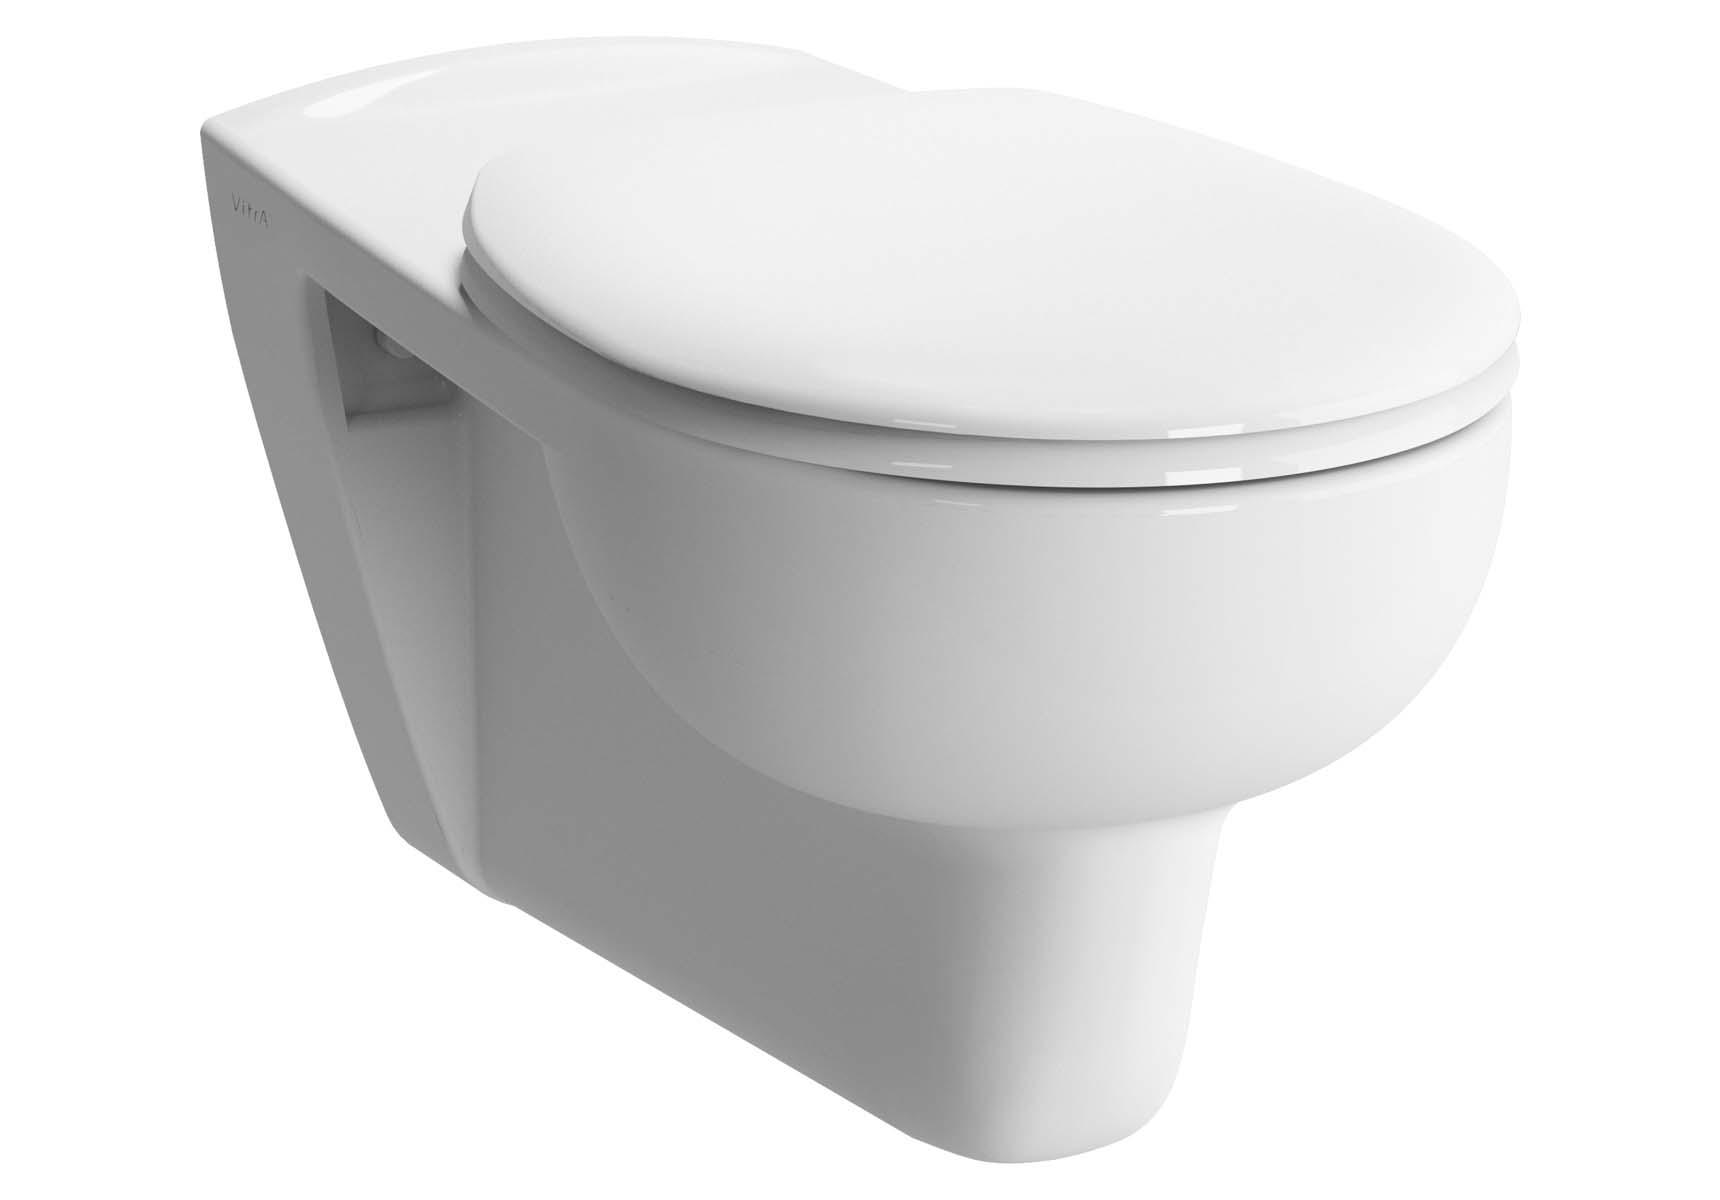 Conforma Special Needs Rim-Ex Wall-Hung Wc Pan, 70 cm